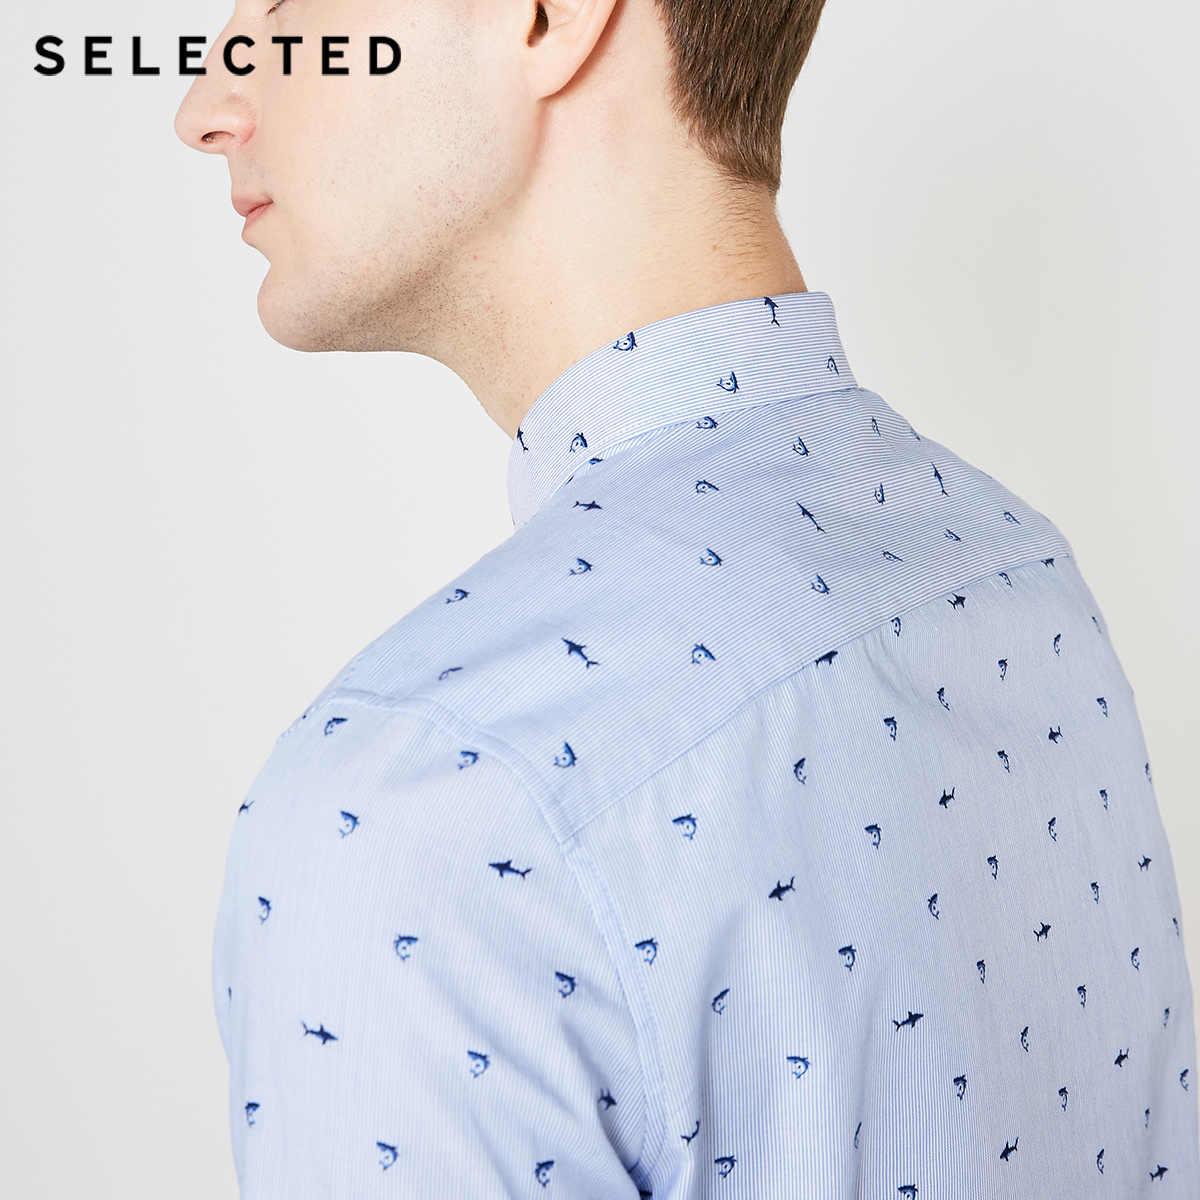 SELECTED 남성 슬림 피트 자수 코튼 반소매 셔츠 S | 419204511